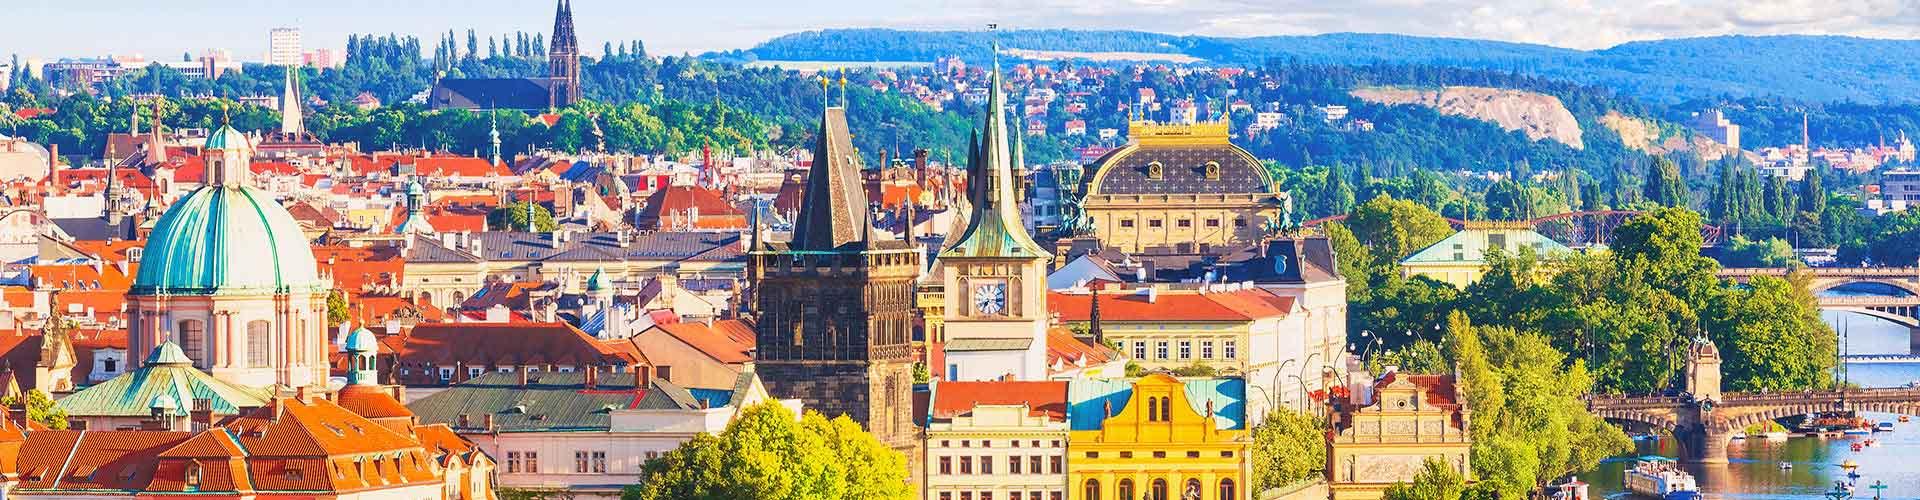 Praga – Ostelli a Praga. Mappe per Praga, Foto e  Recensioni per ogni Ostello a Praga.